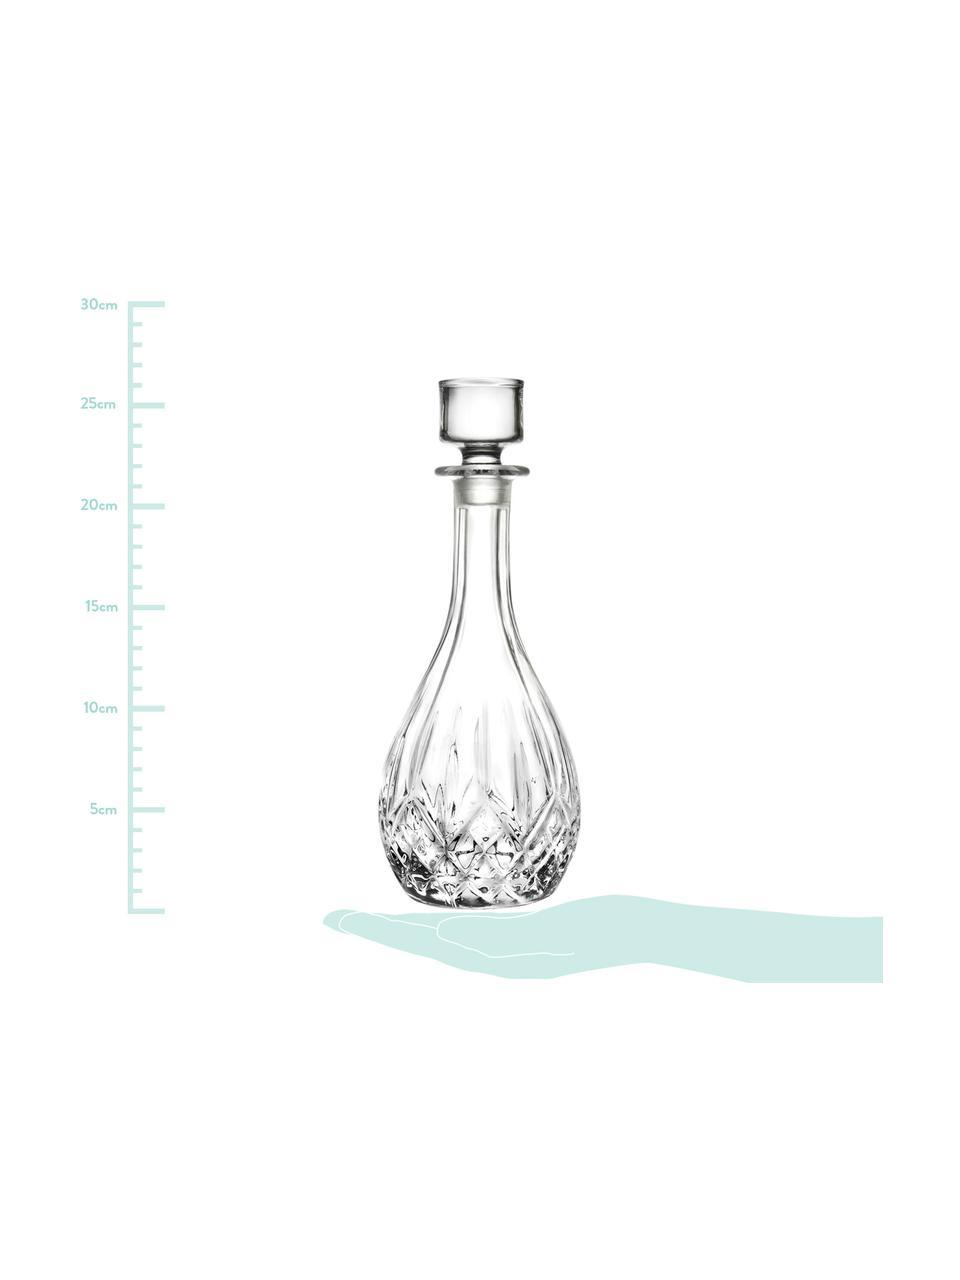 Carafe à décanter cristal avec bouchonRotonda, 900ml, Transparent